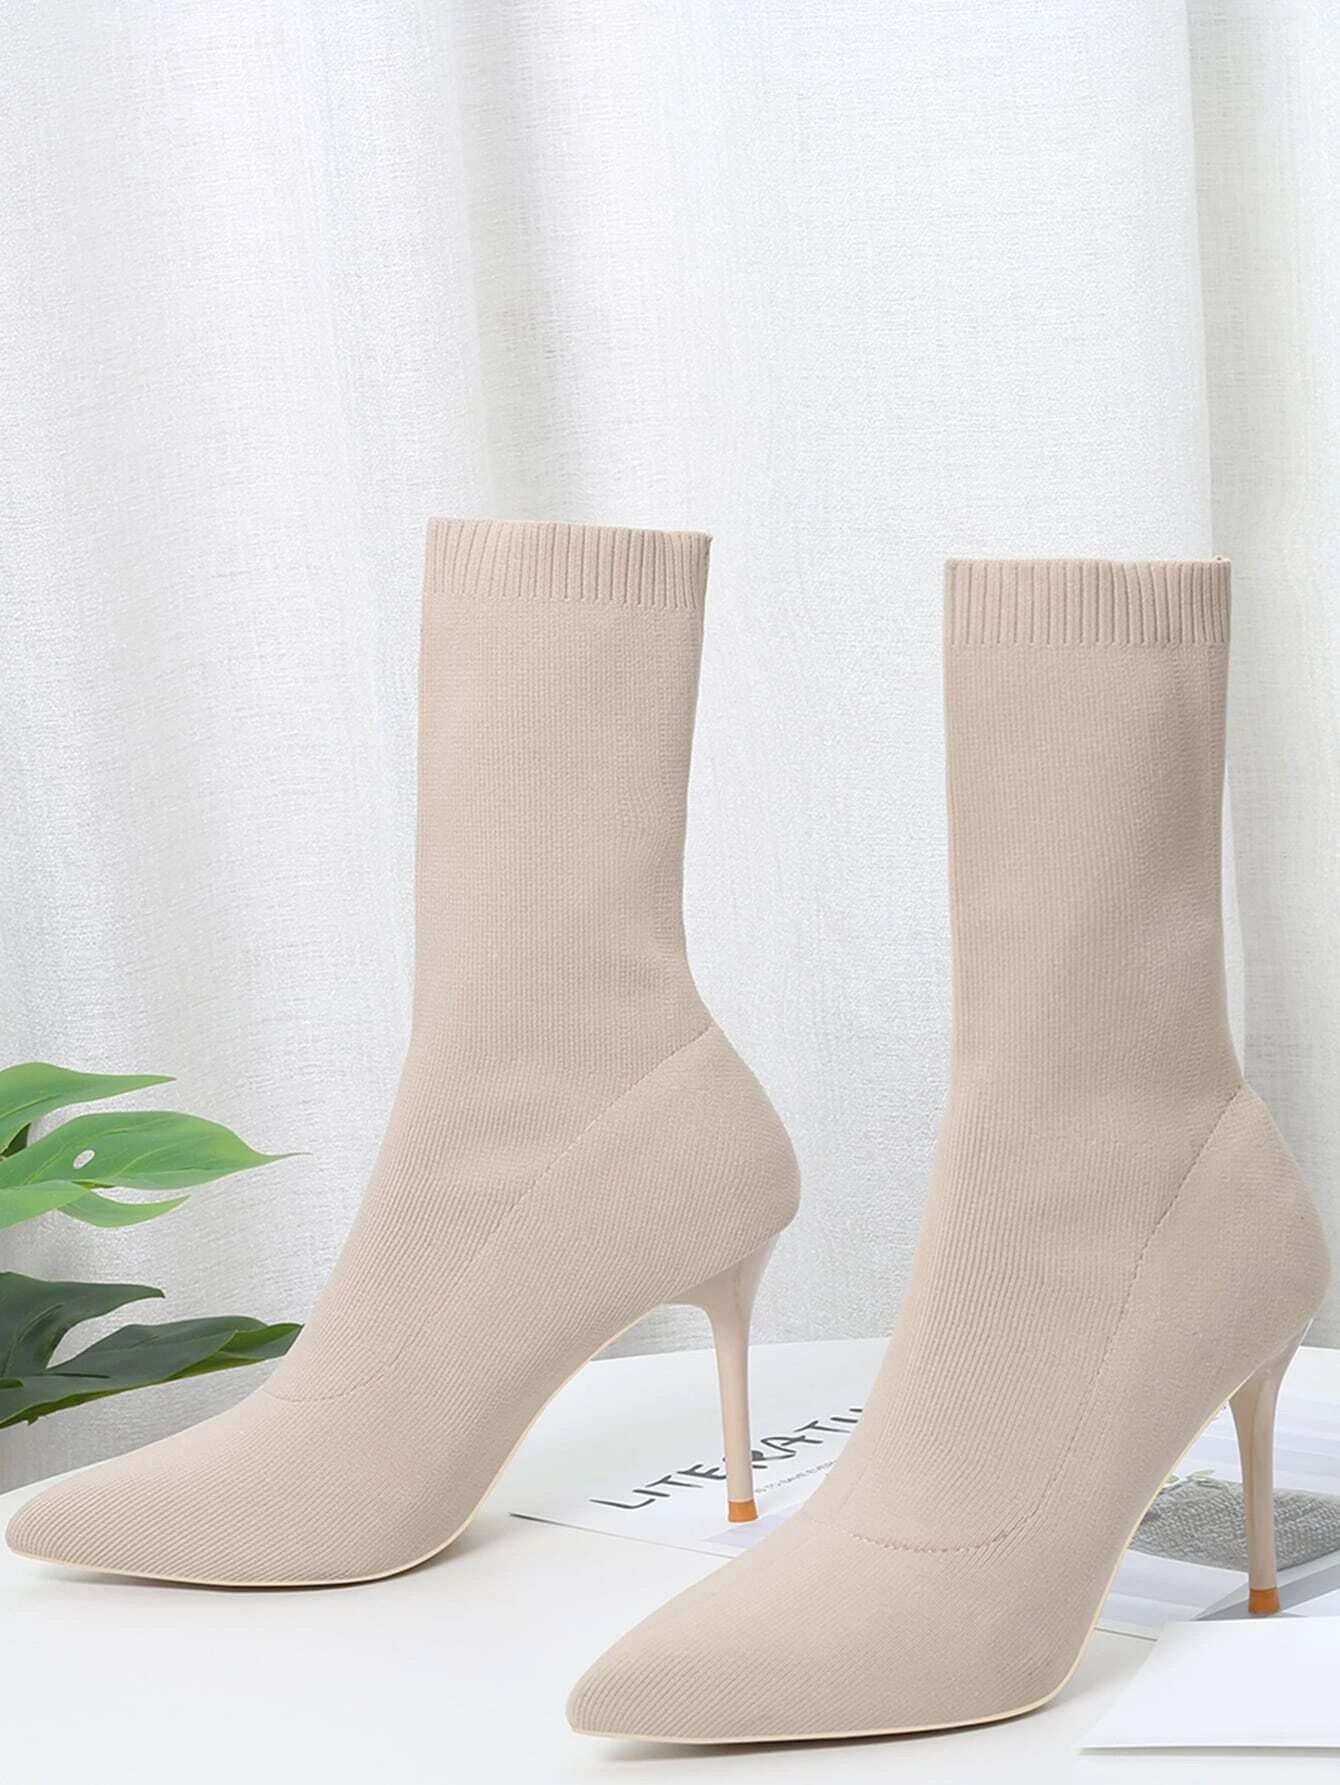 Point Toe Stiletto Heeled Knit Sock Boots